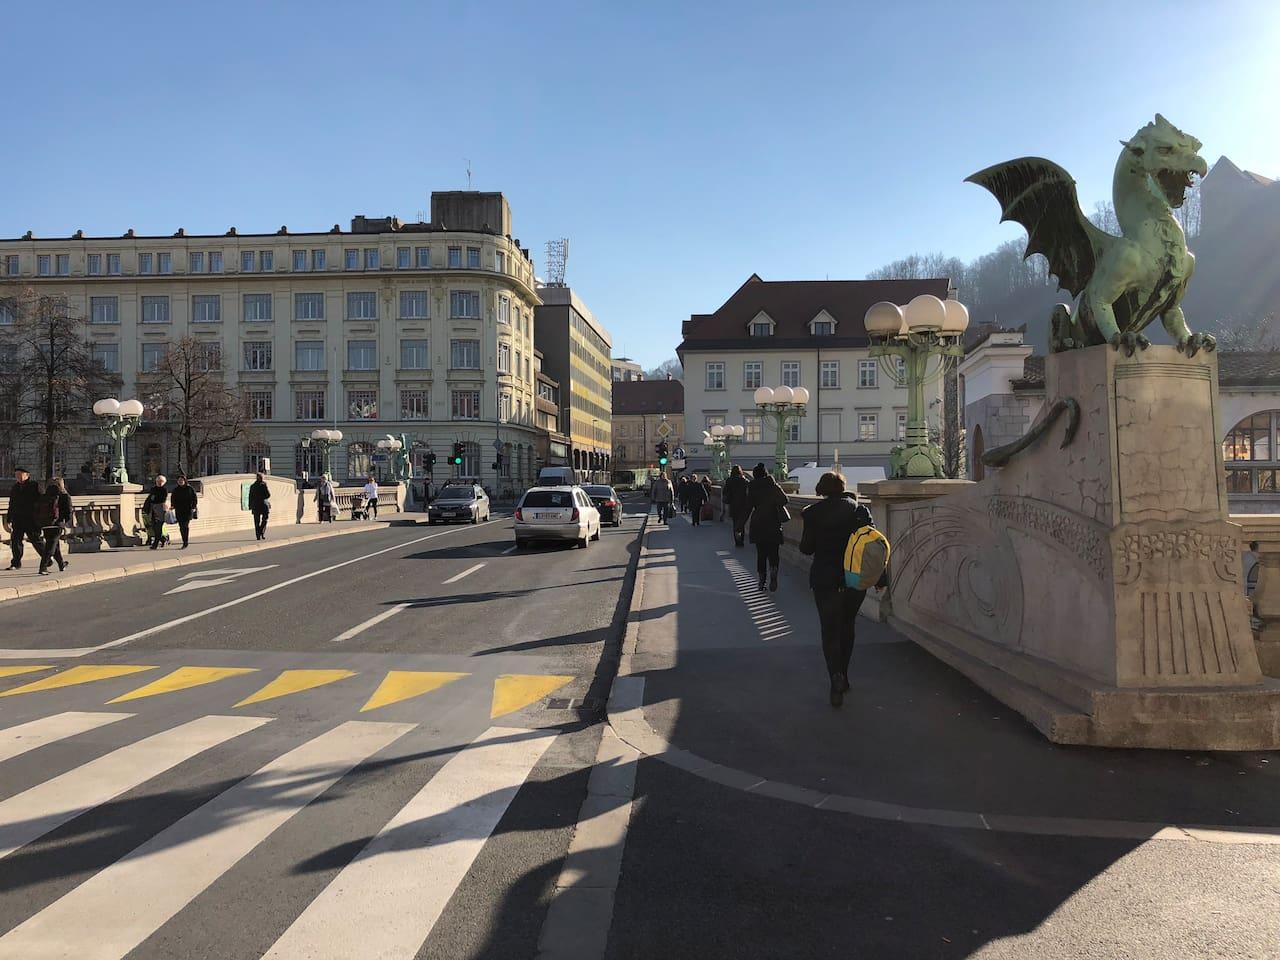 Ljubljana's iconic Dragon bridge is located on my street.